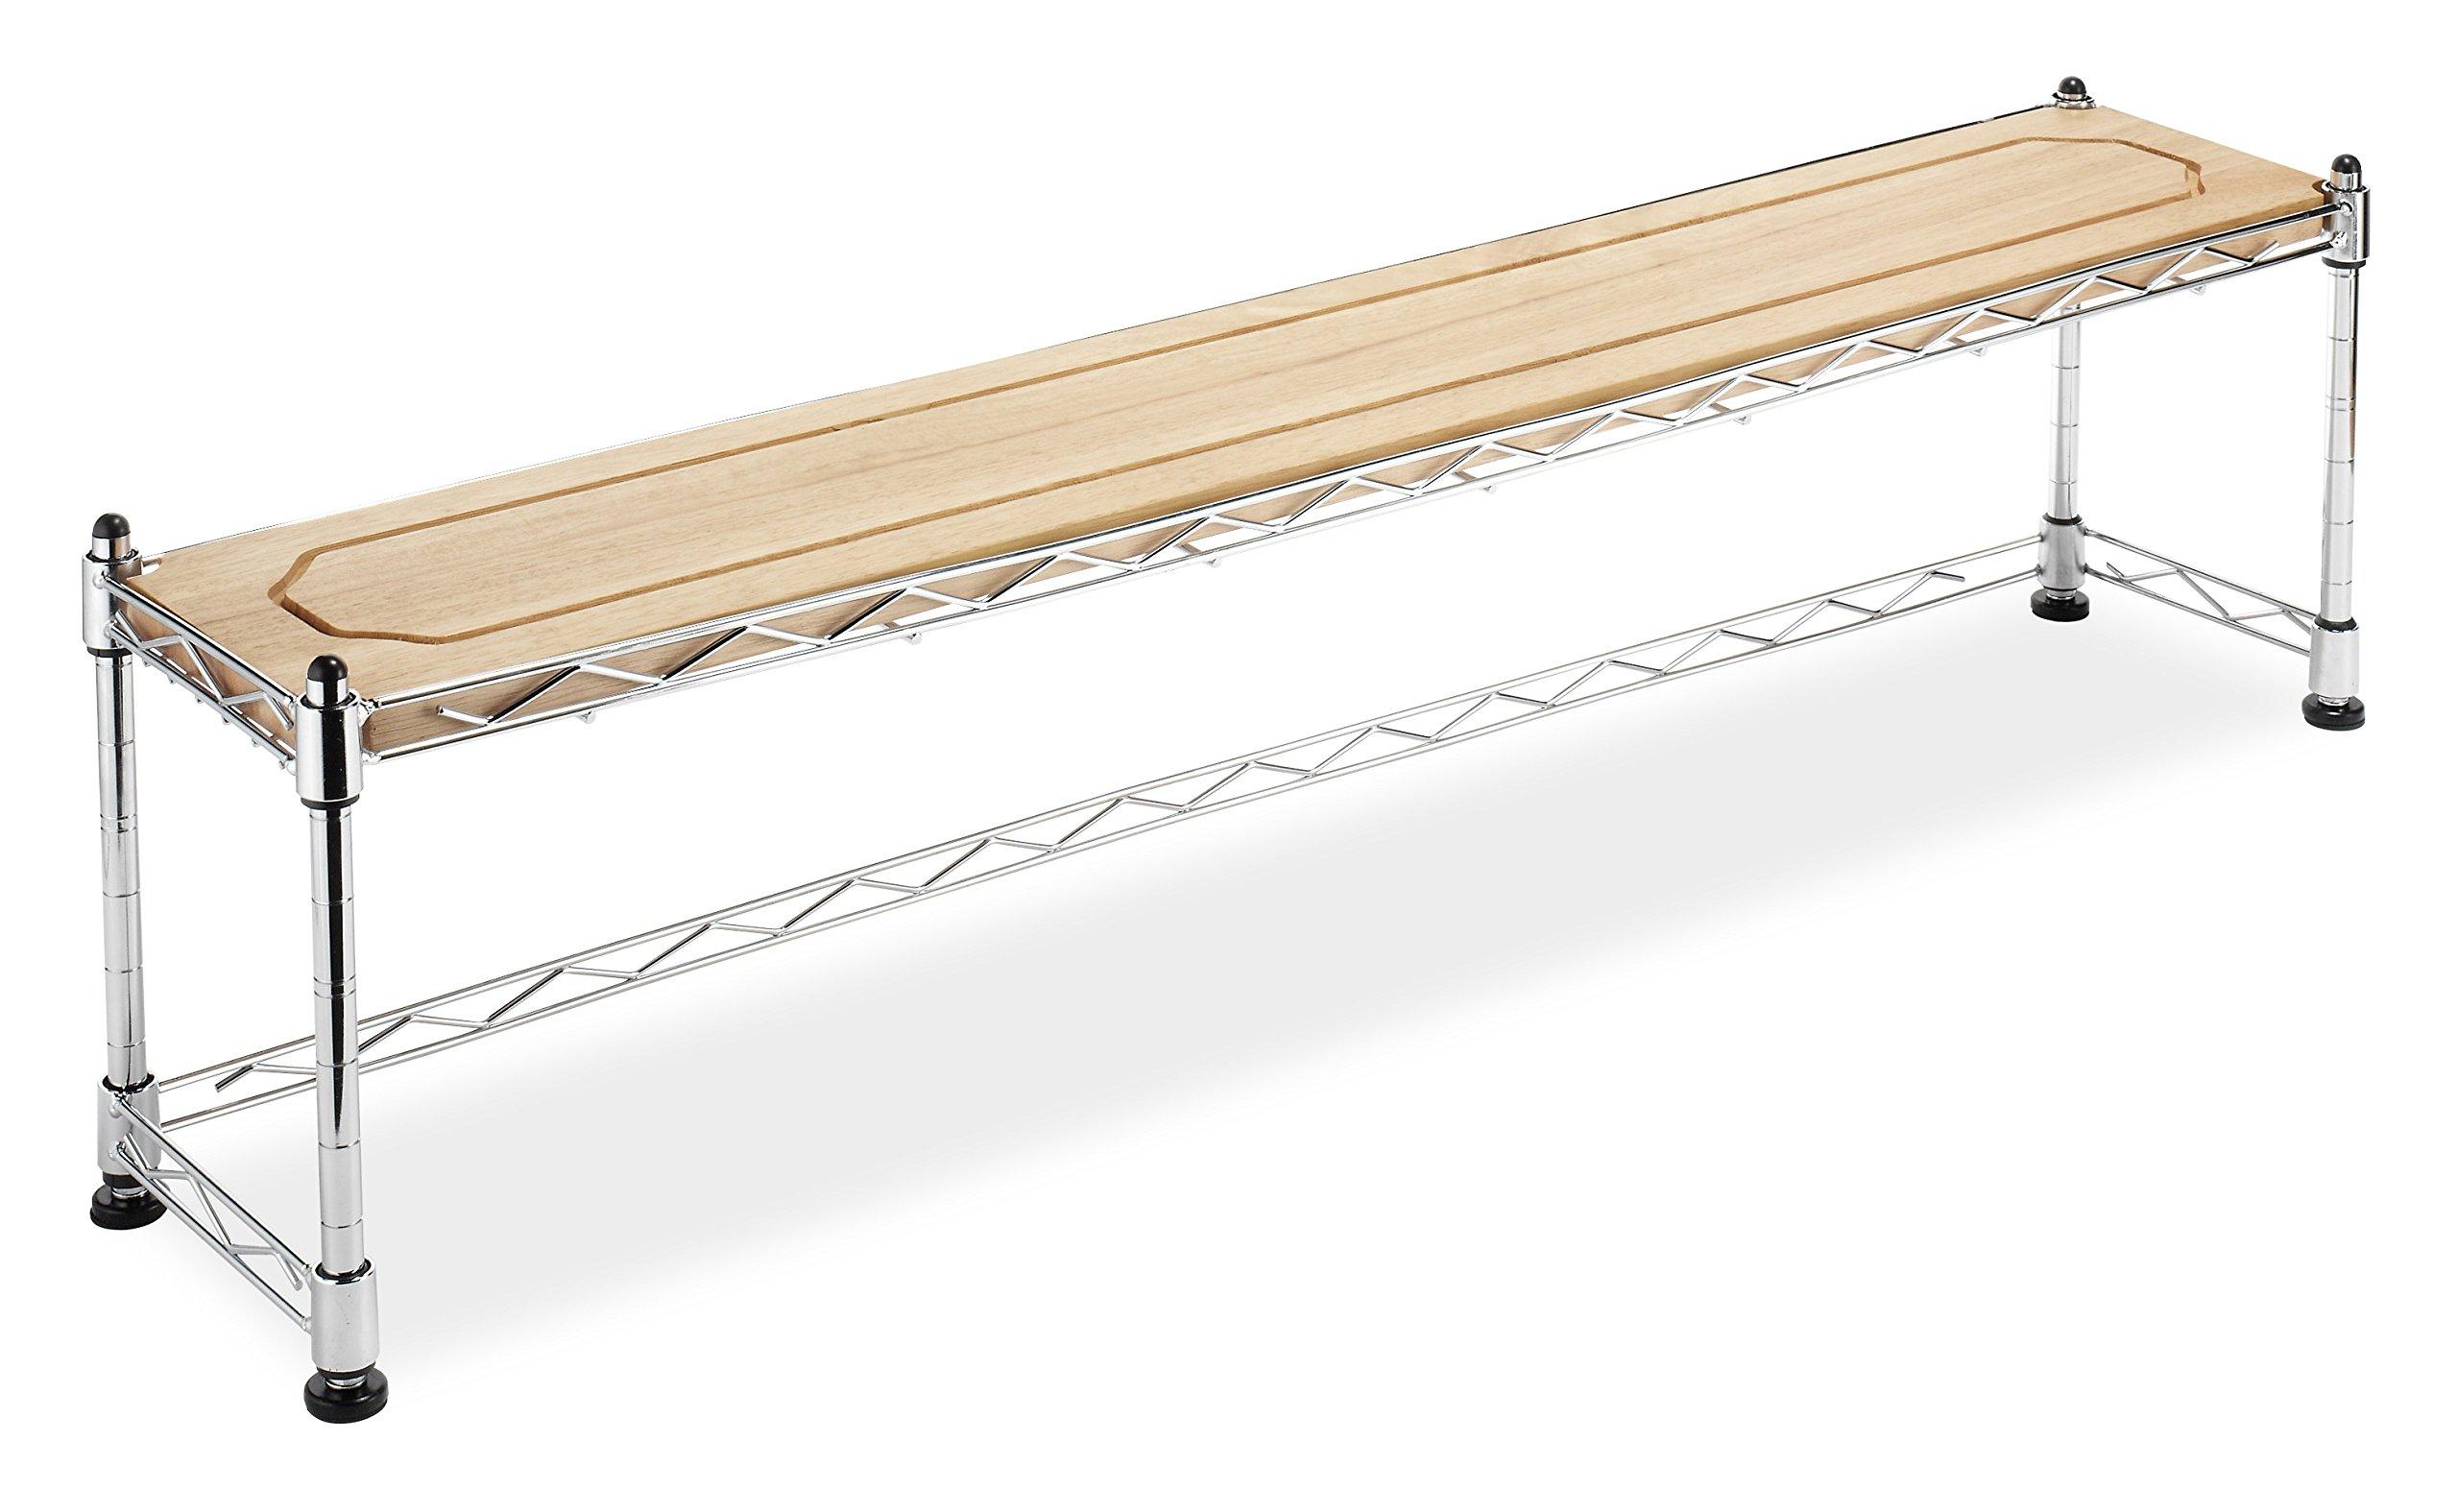 Whitmor Supreme Sink Shelf - Multiuse Organizer - Wood and Chrome